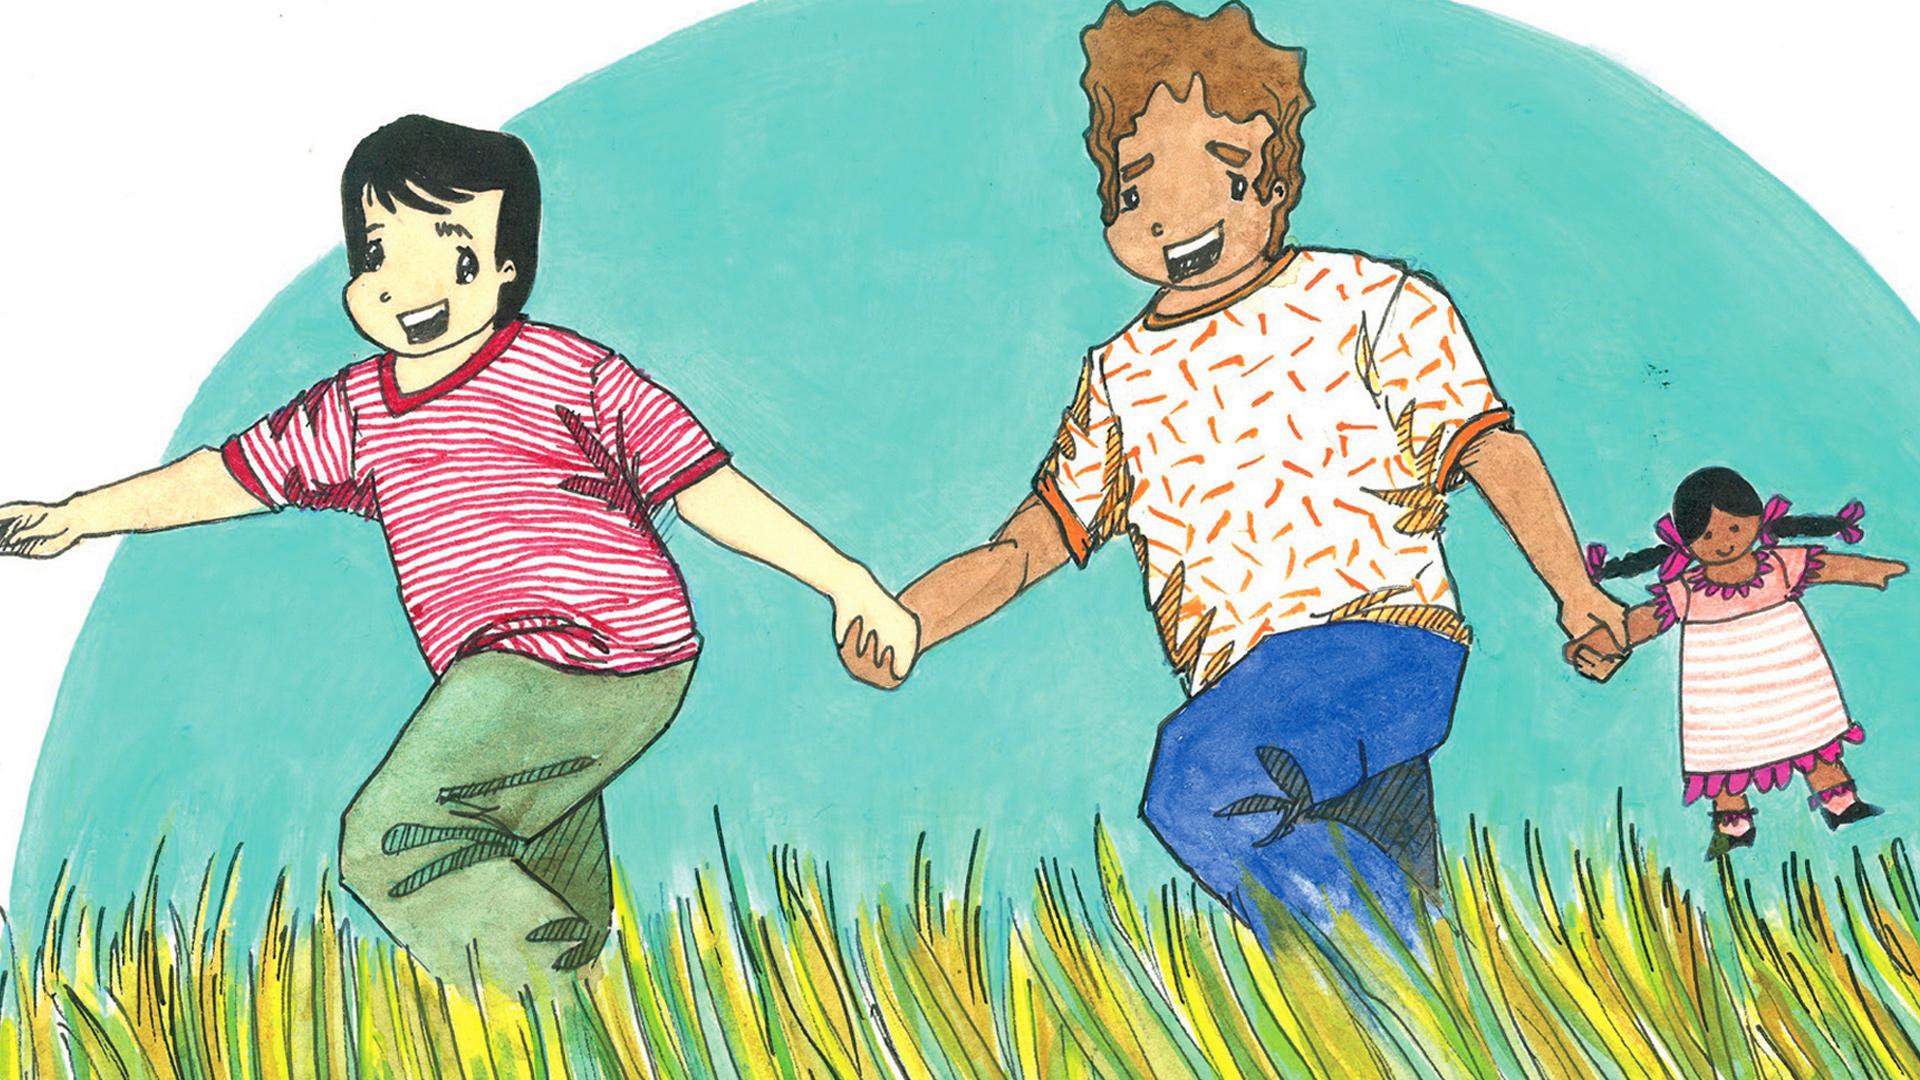 Writer/Director Jesus Canchola Sanchez Talks Pepito, LGBTQ, and Acceptance